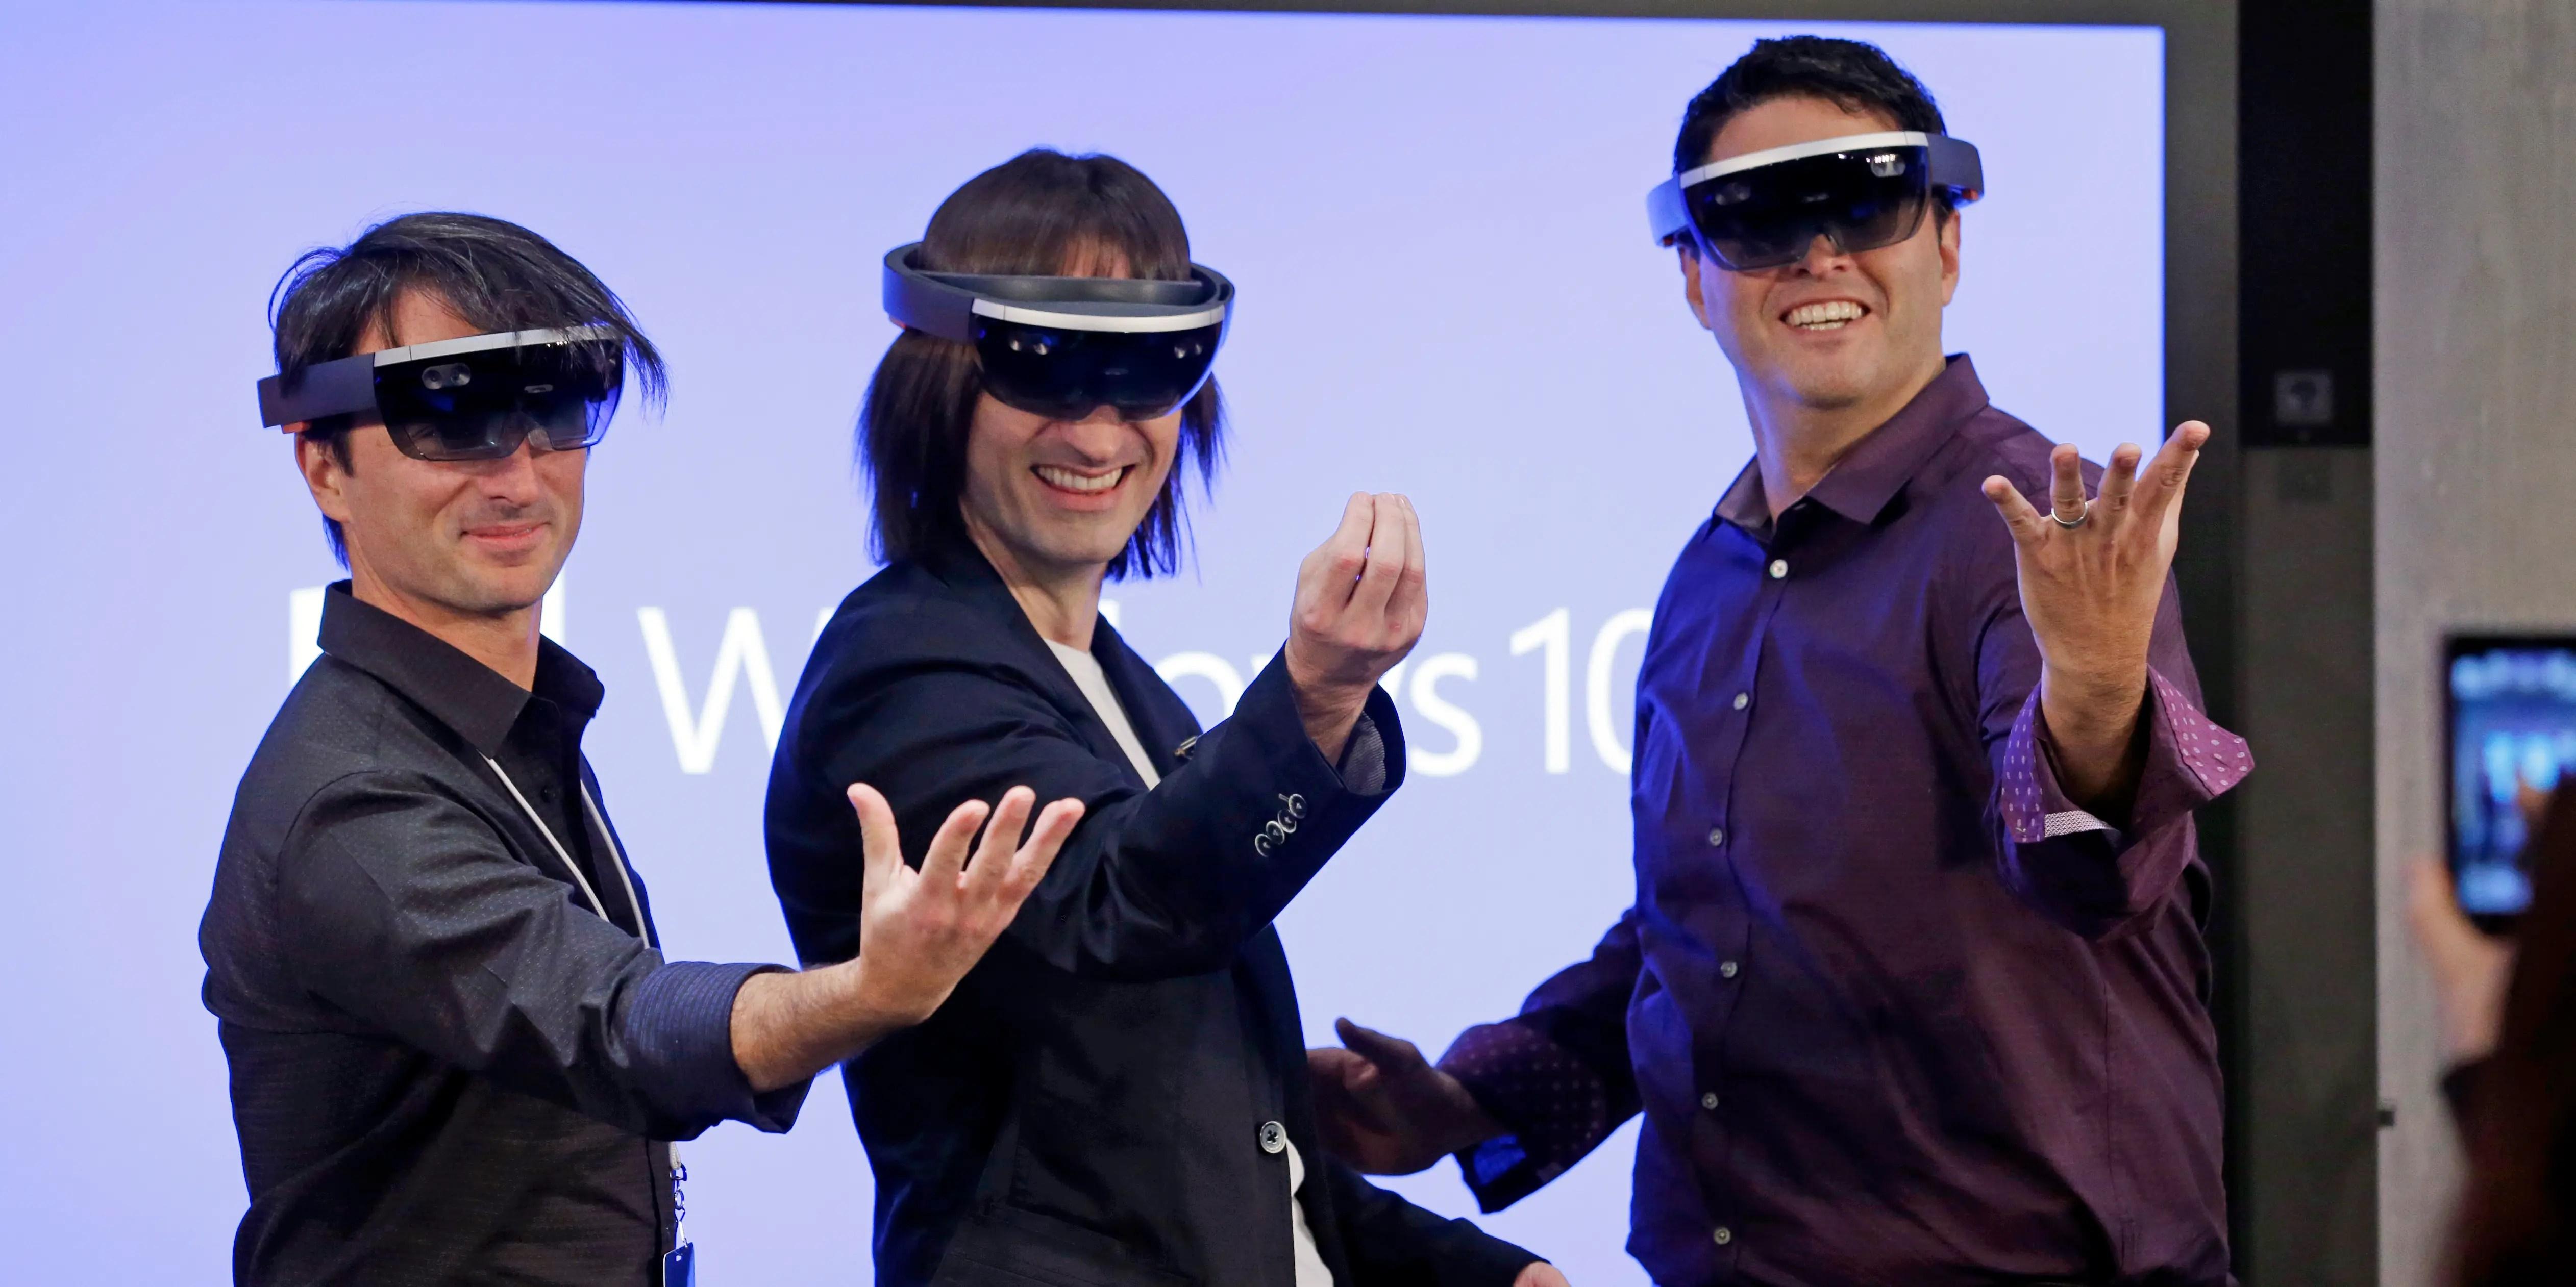 Microsoft executives testing HoloLens